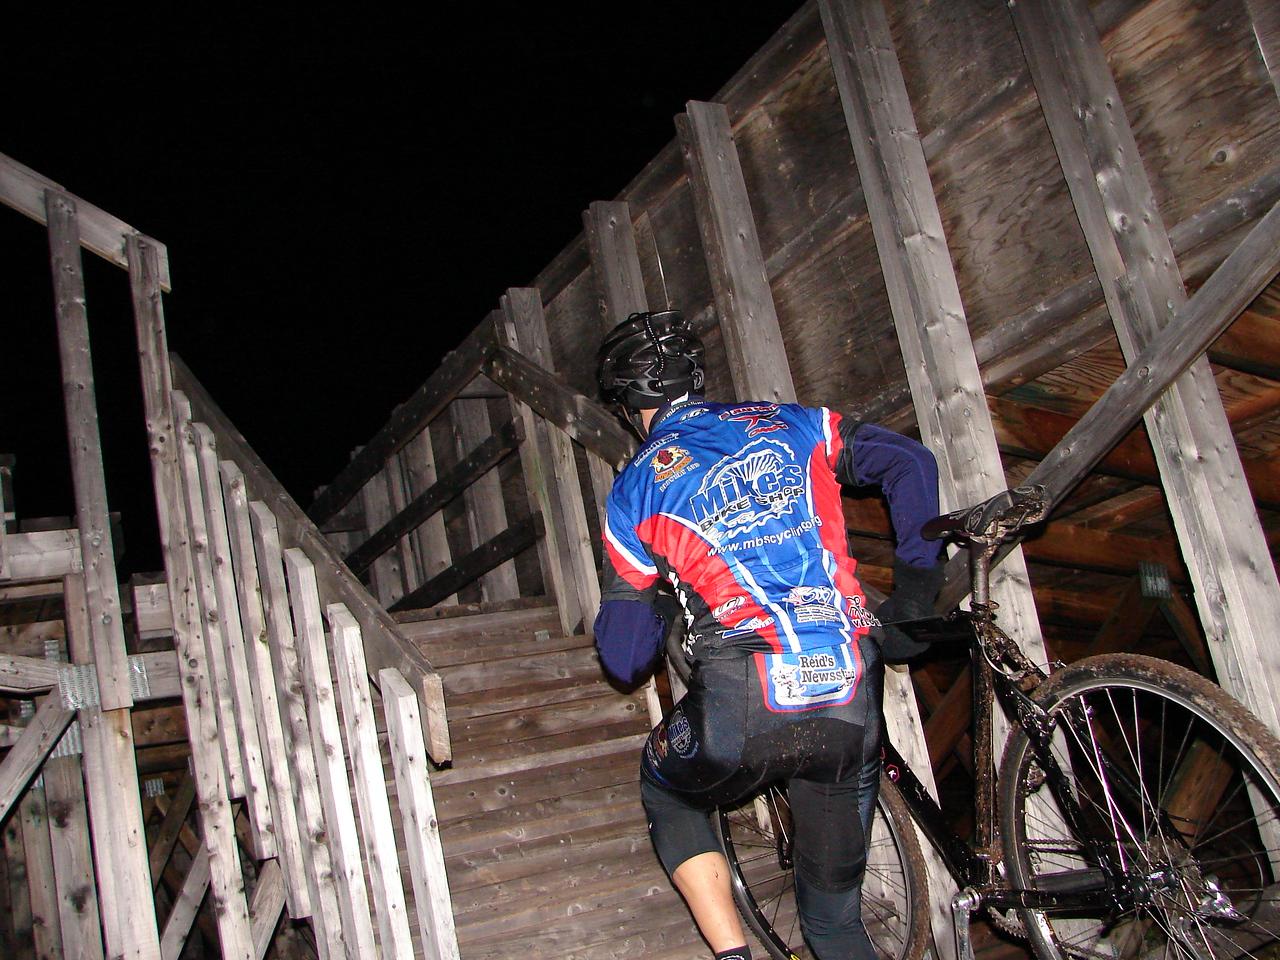 Mike making it look easy